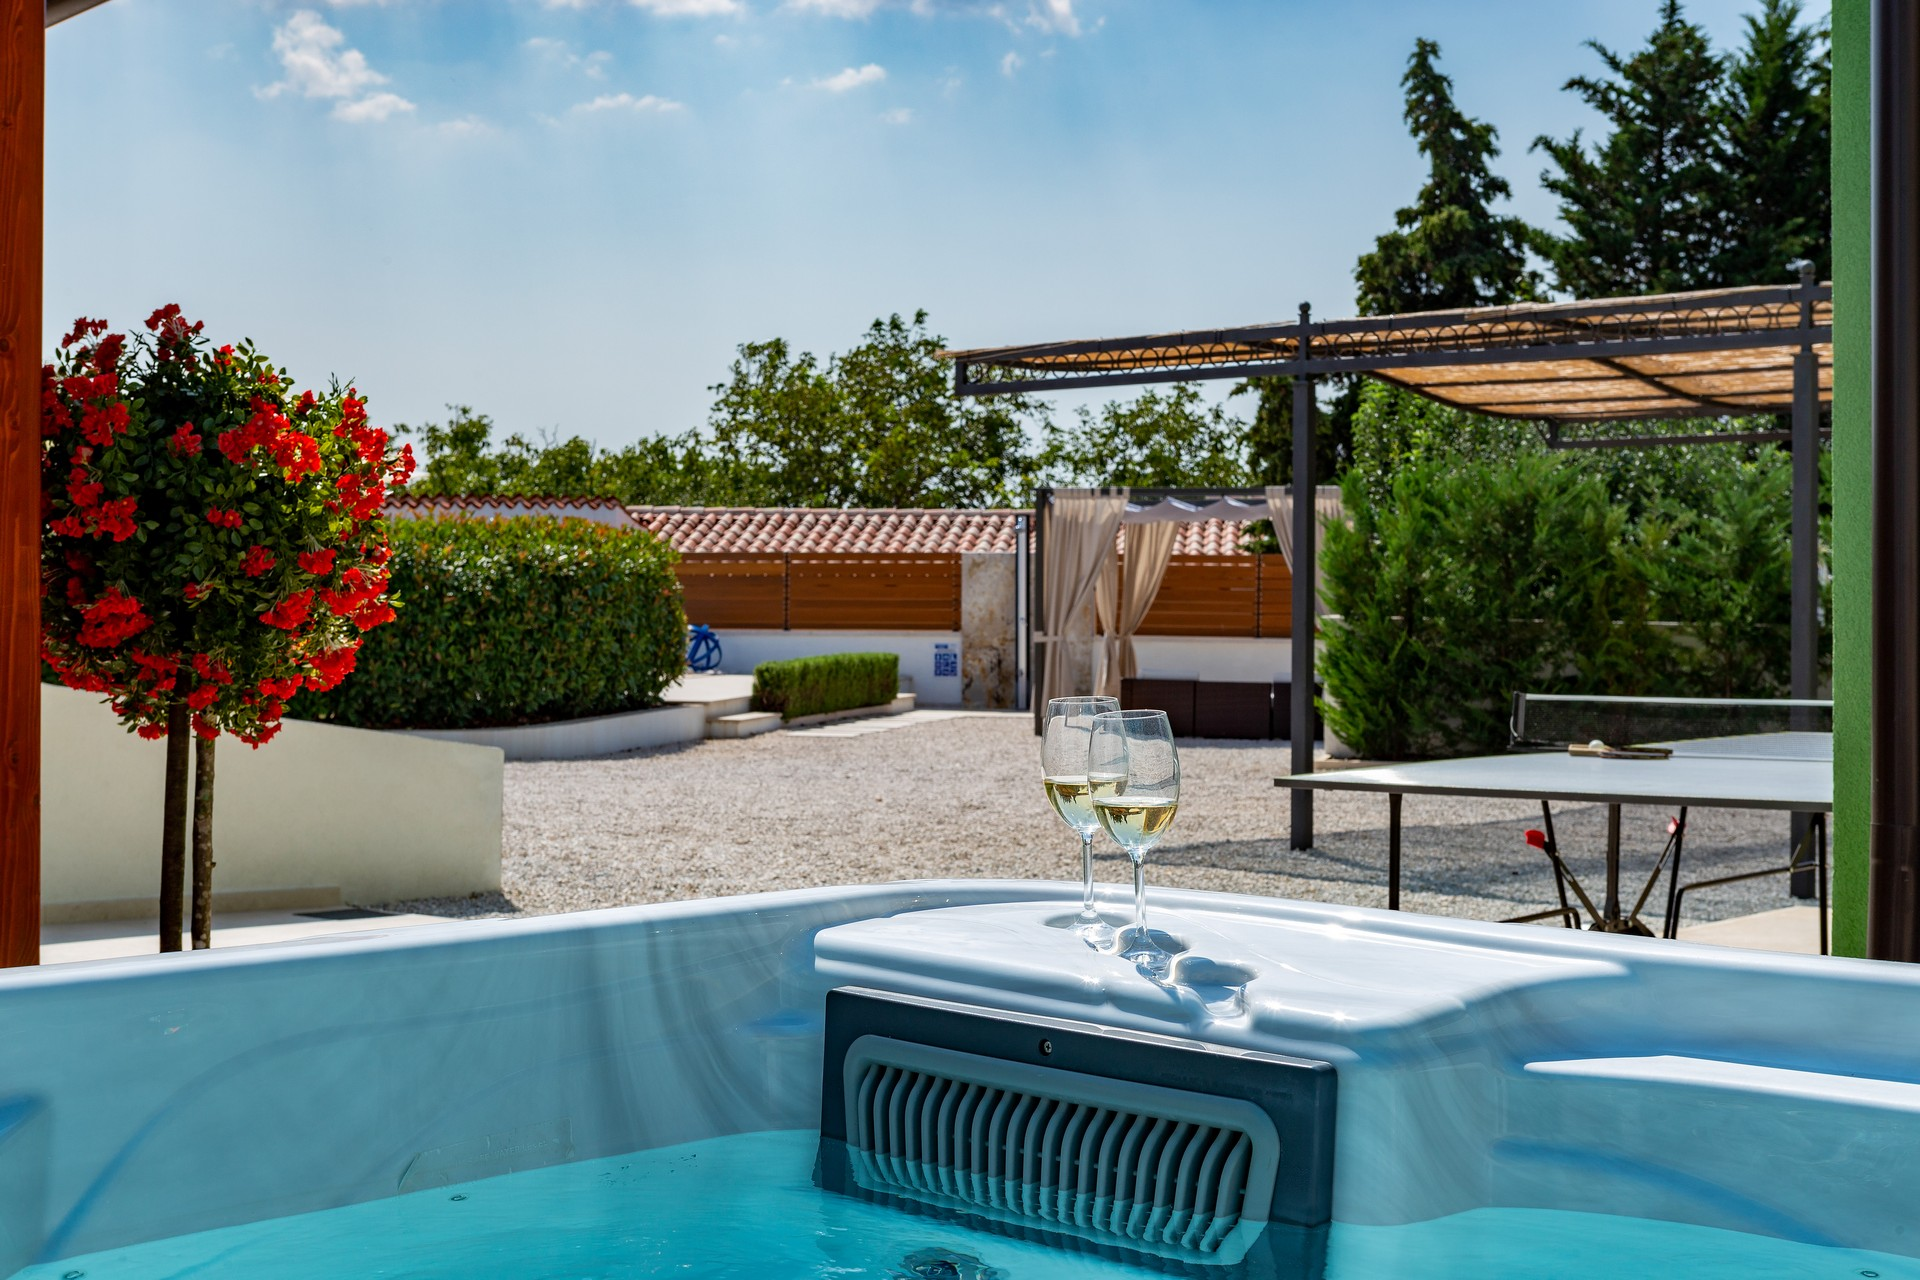 villa deal outdoors (34)